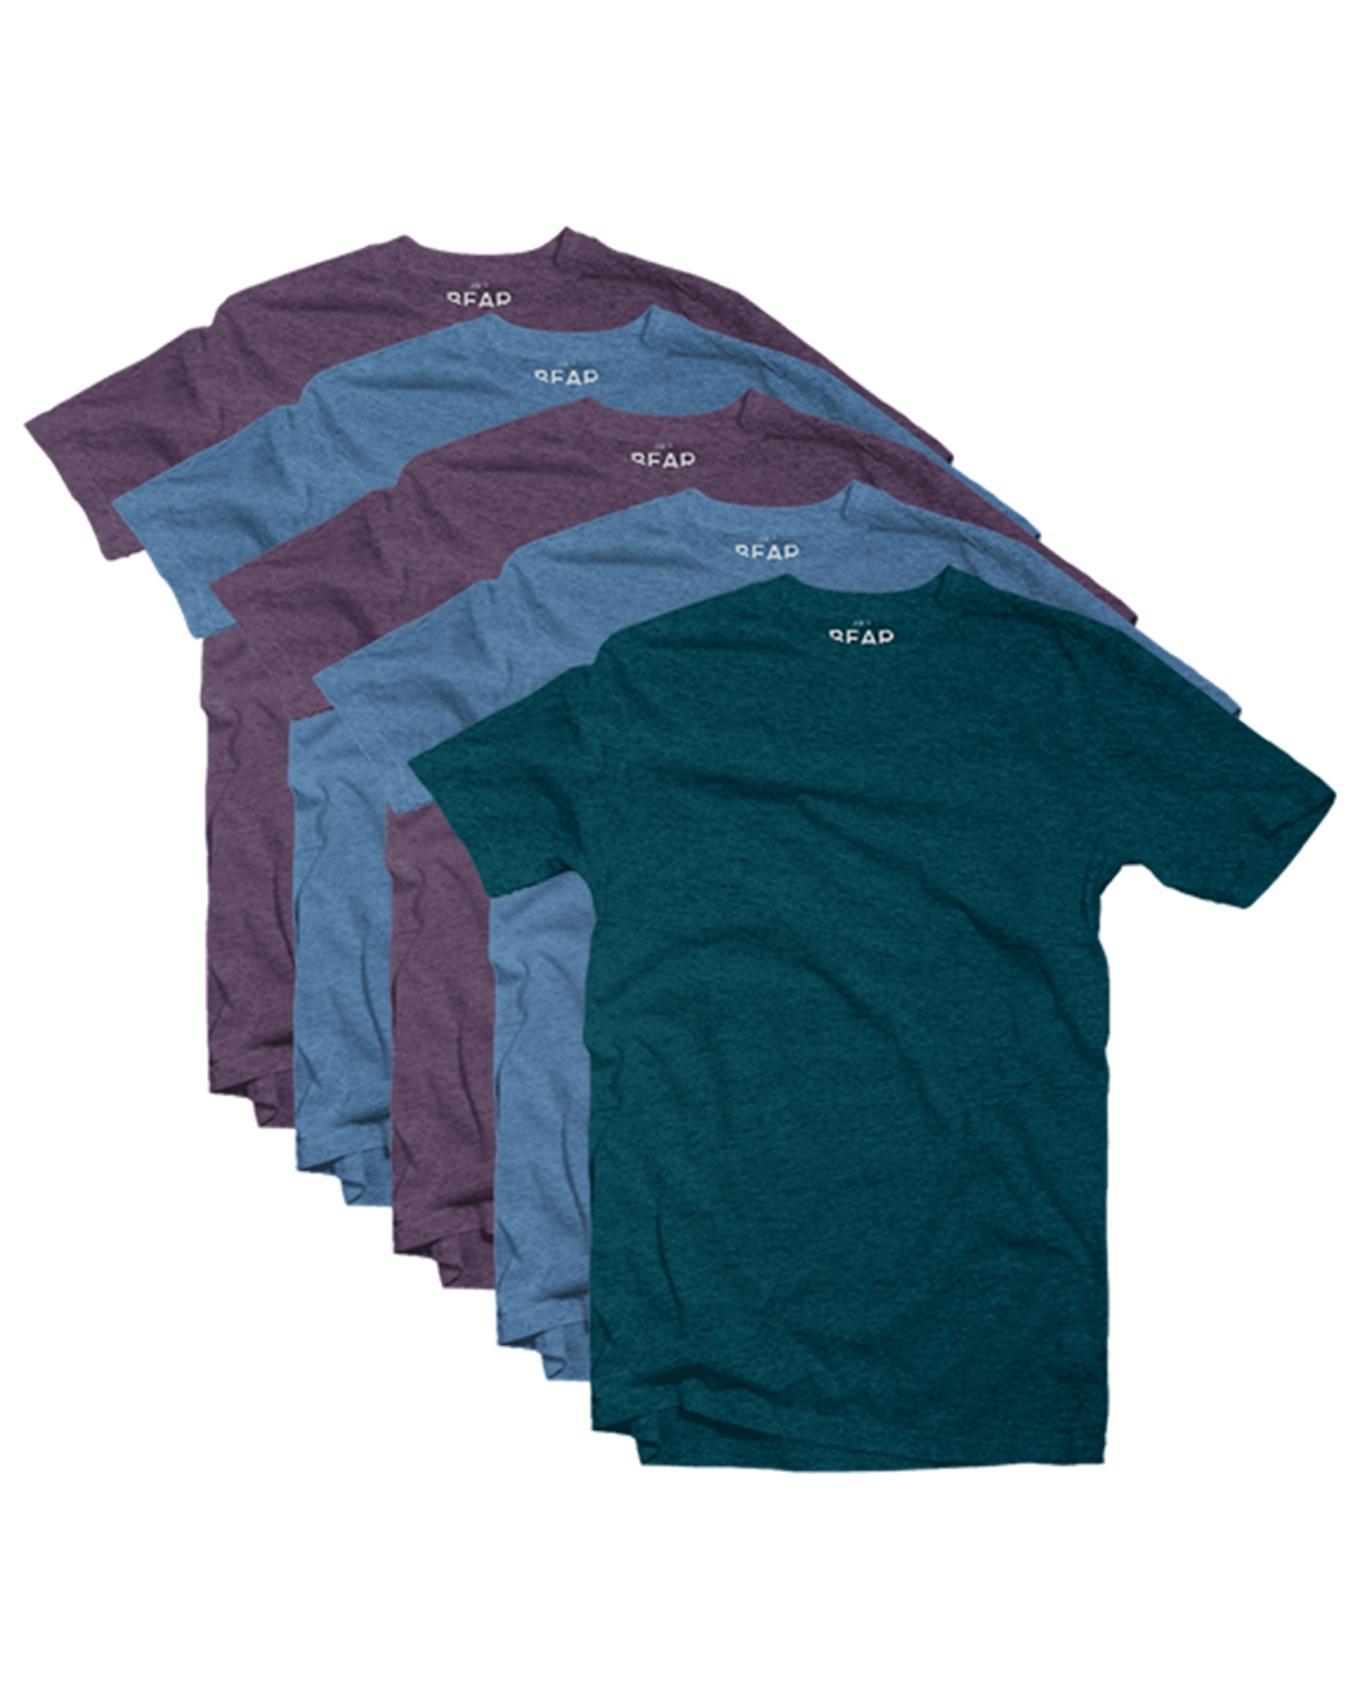 Men's Crew Neck T-shirts - 5 Pack - Tri-blend